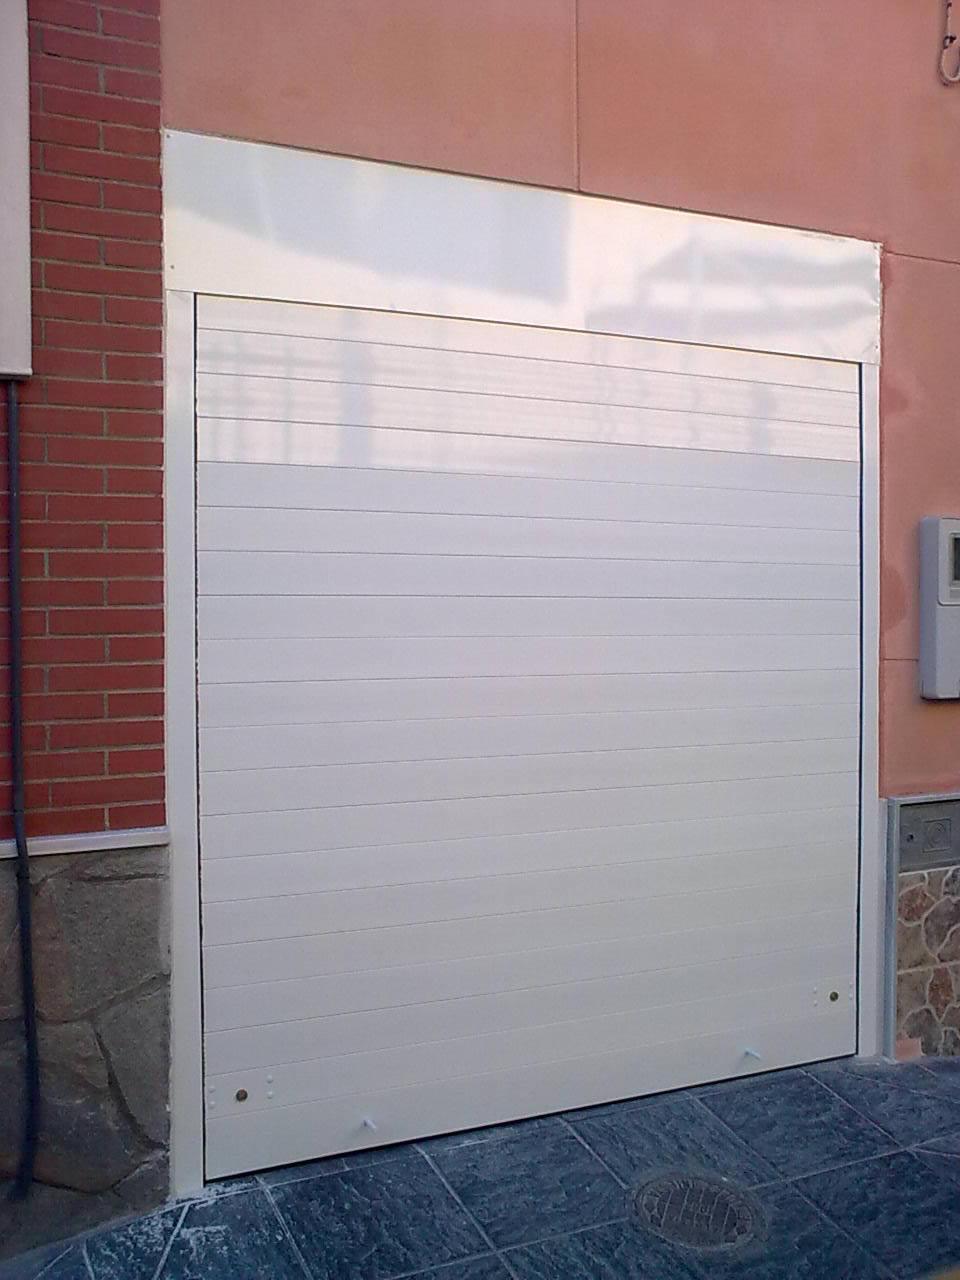 Puertas enrollables canvidres for Puertas enrollables